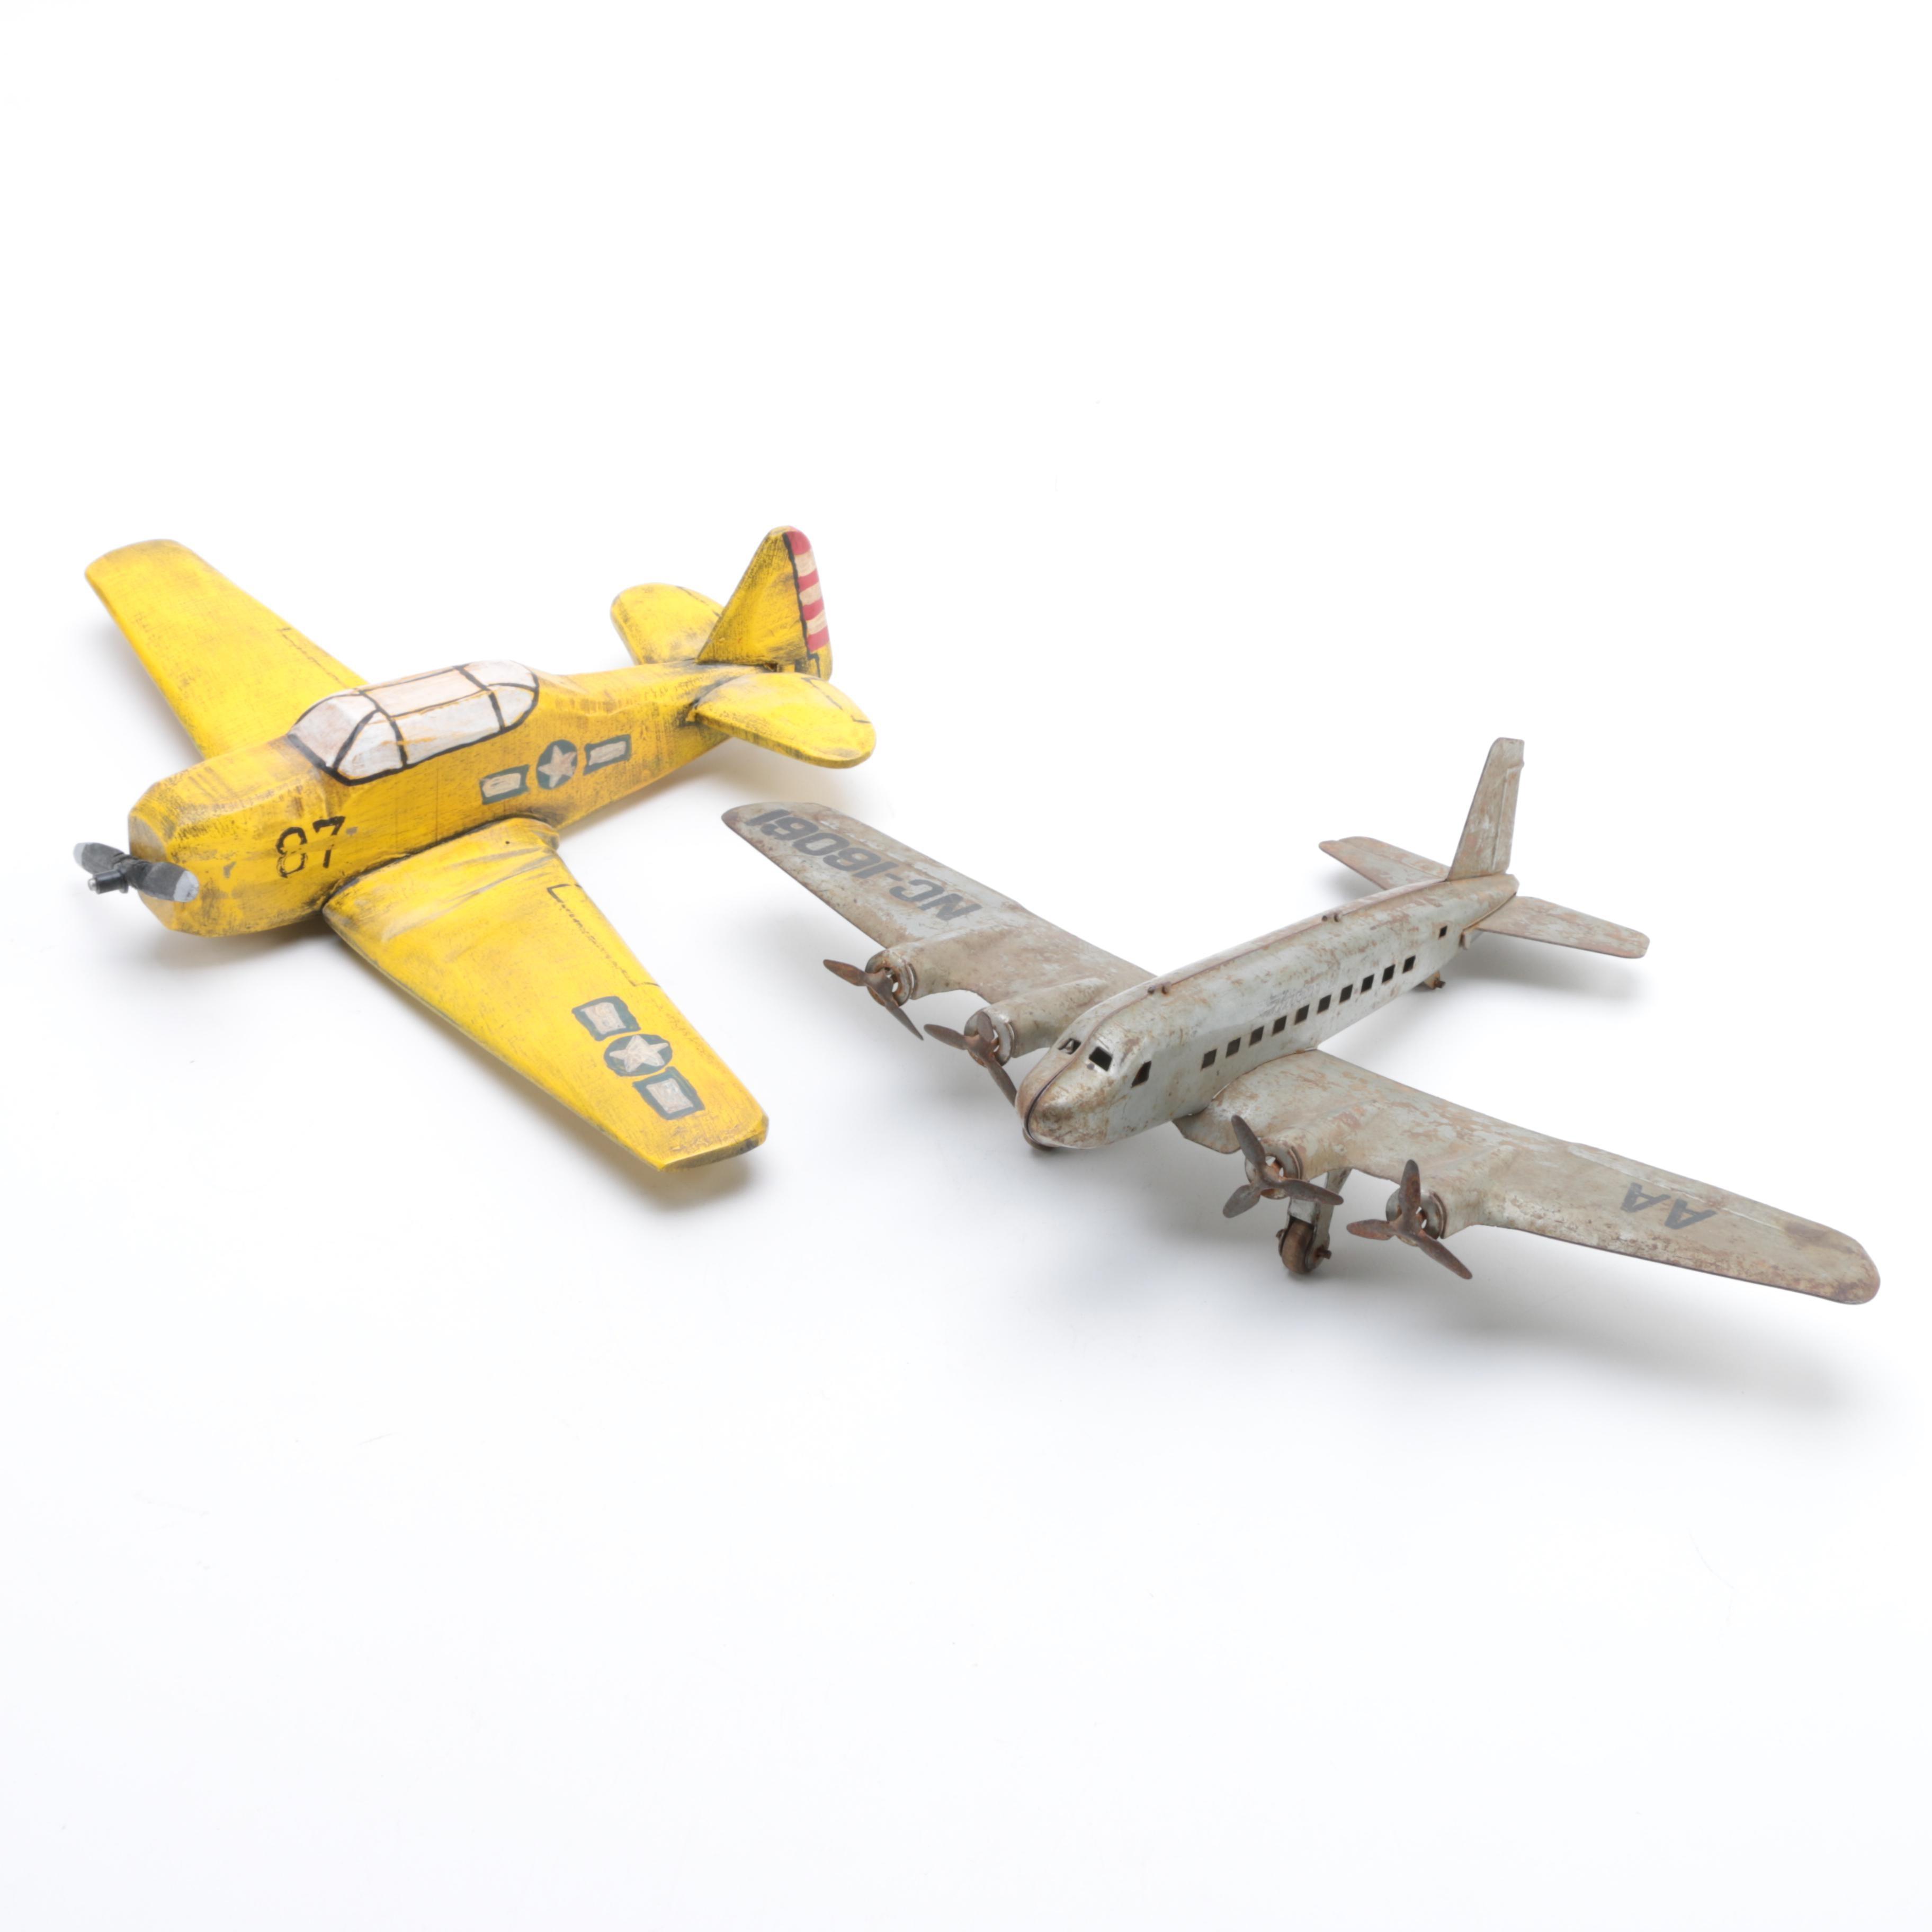 Pair of Model Planes